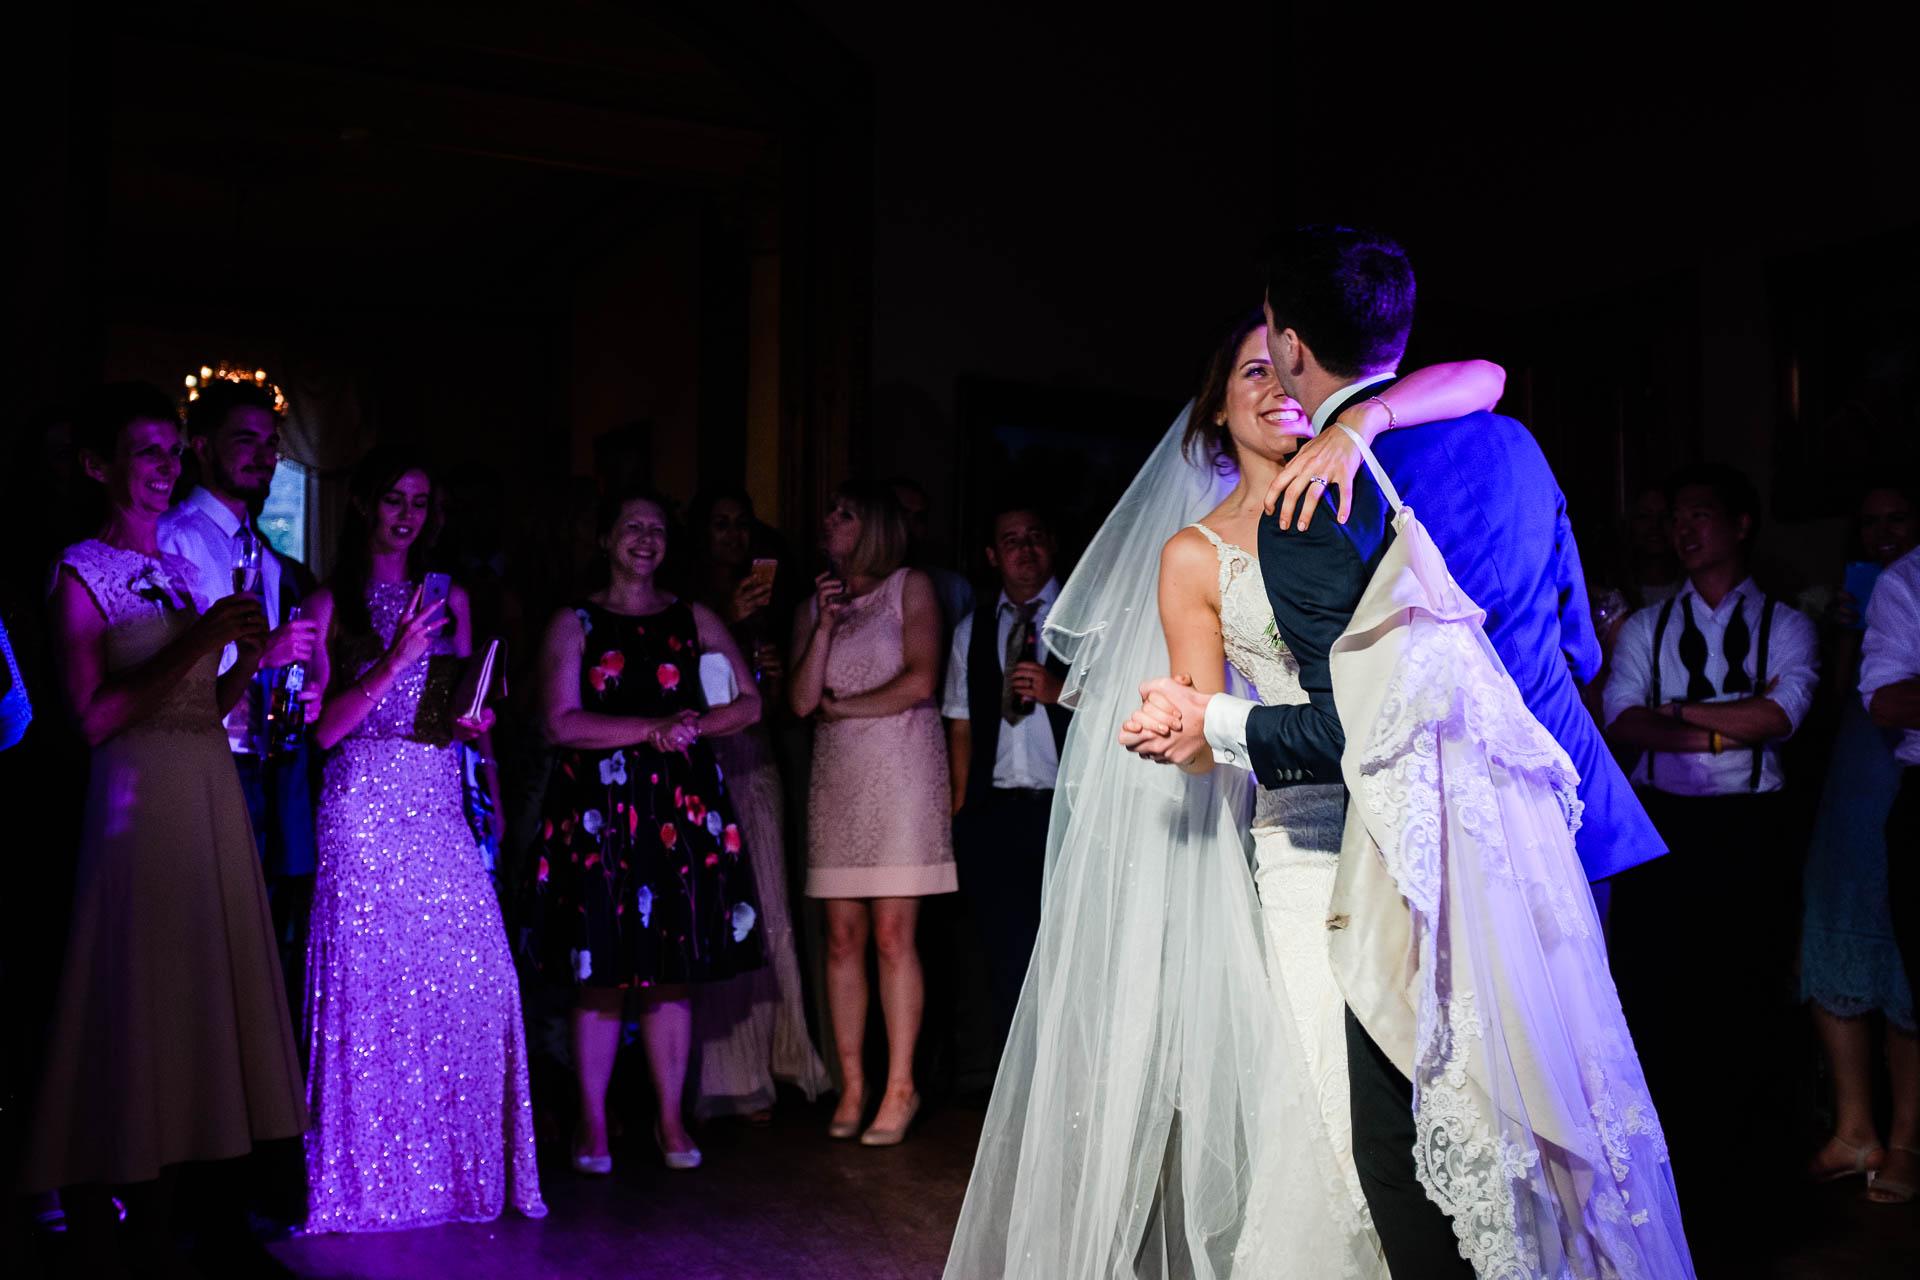 orchardleigh house wedding - Danni & Barney (491).jpg